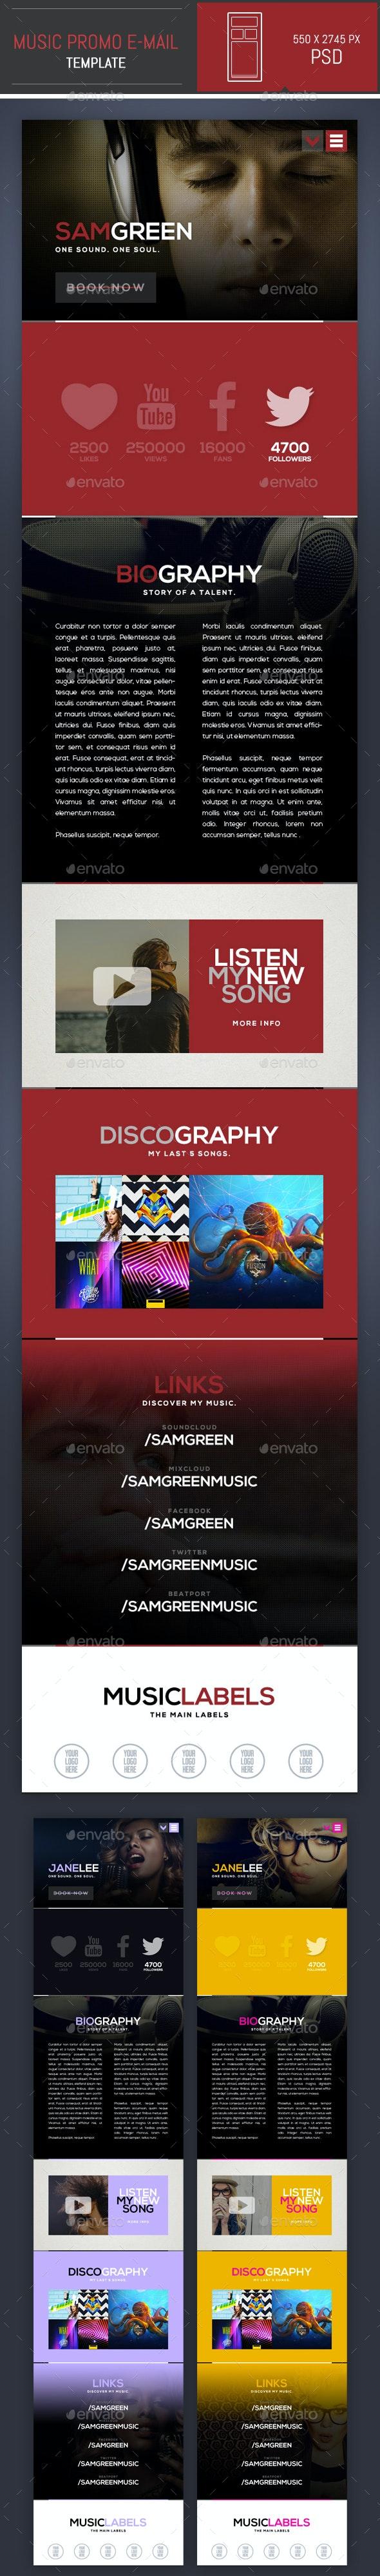 Dj Music Promo Psd E Mail Template